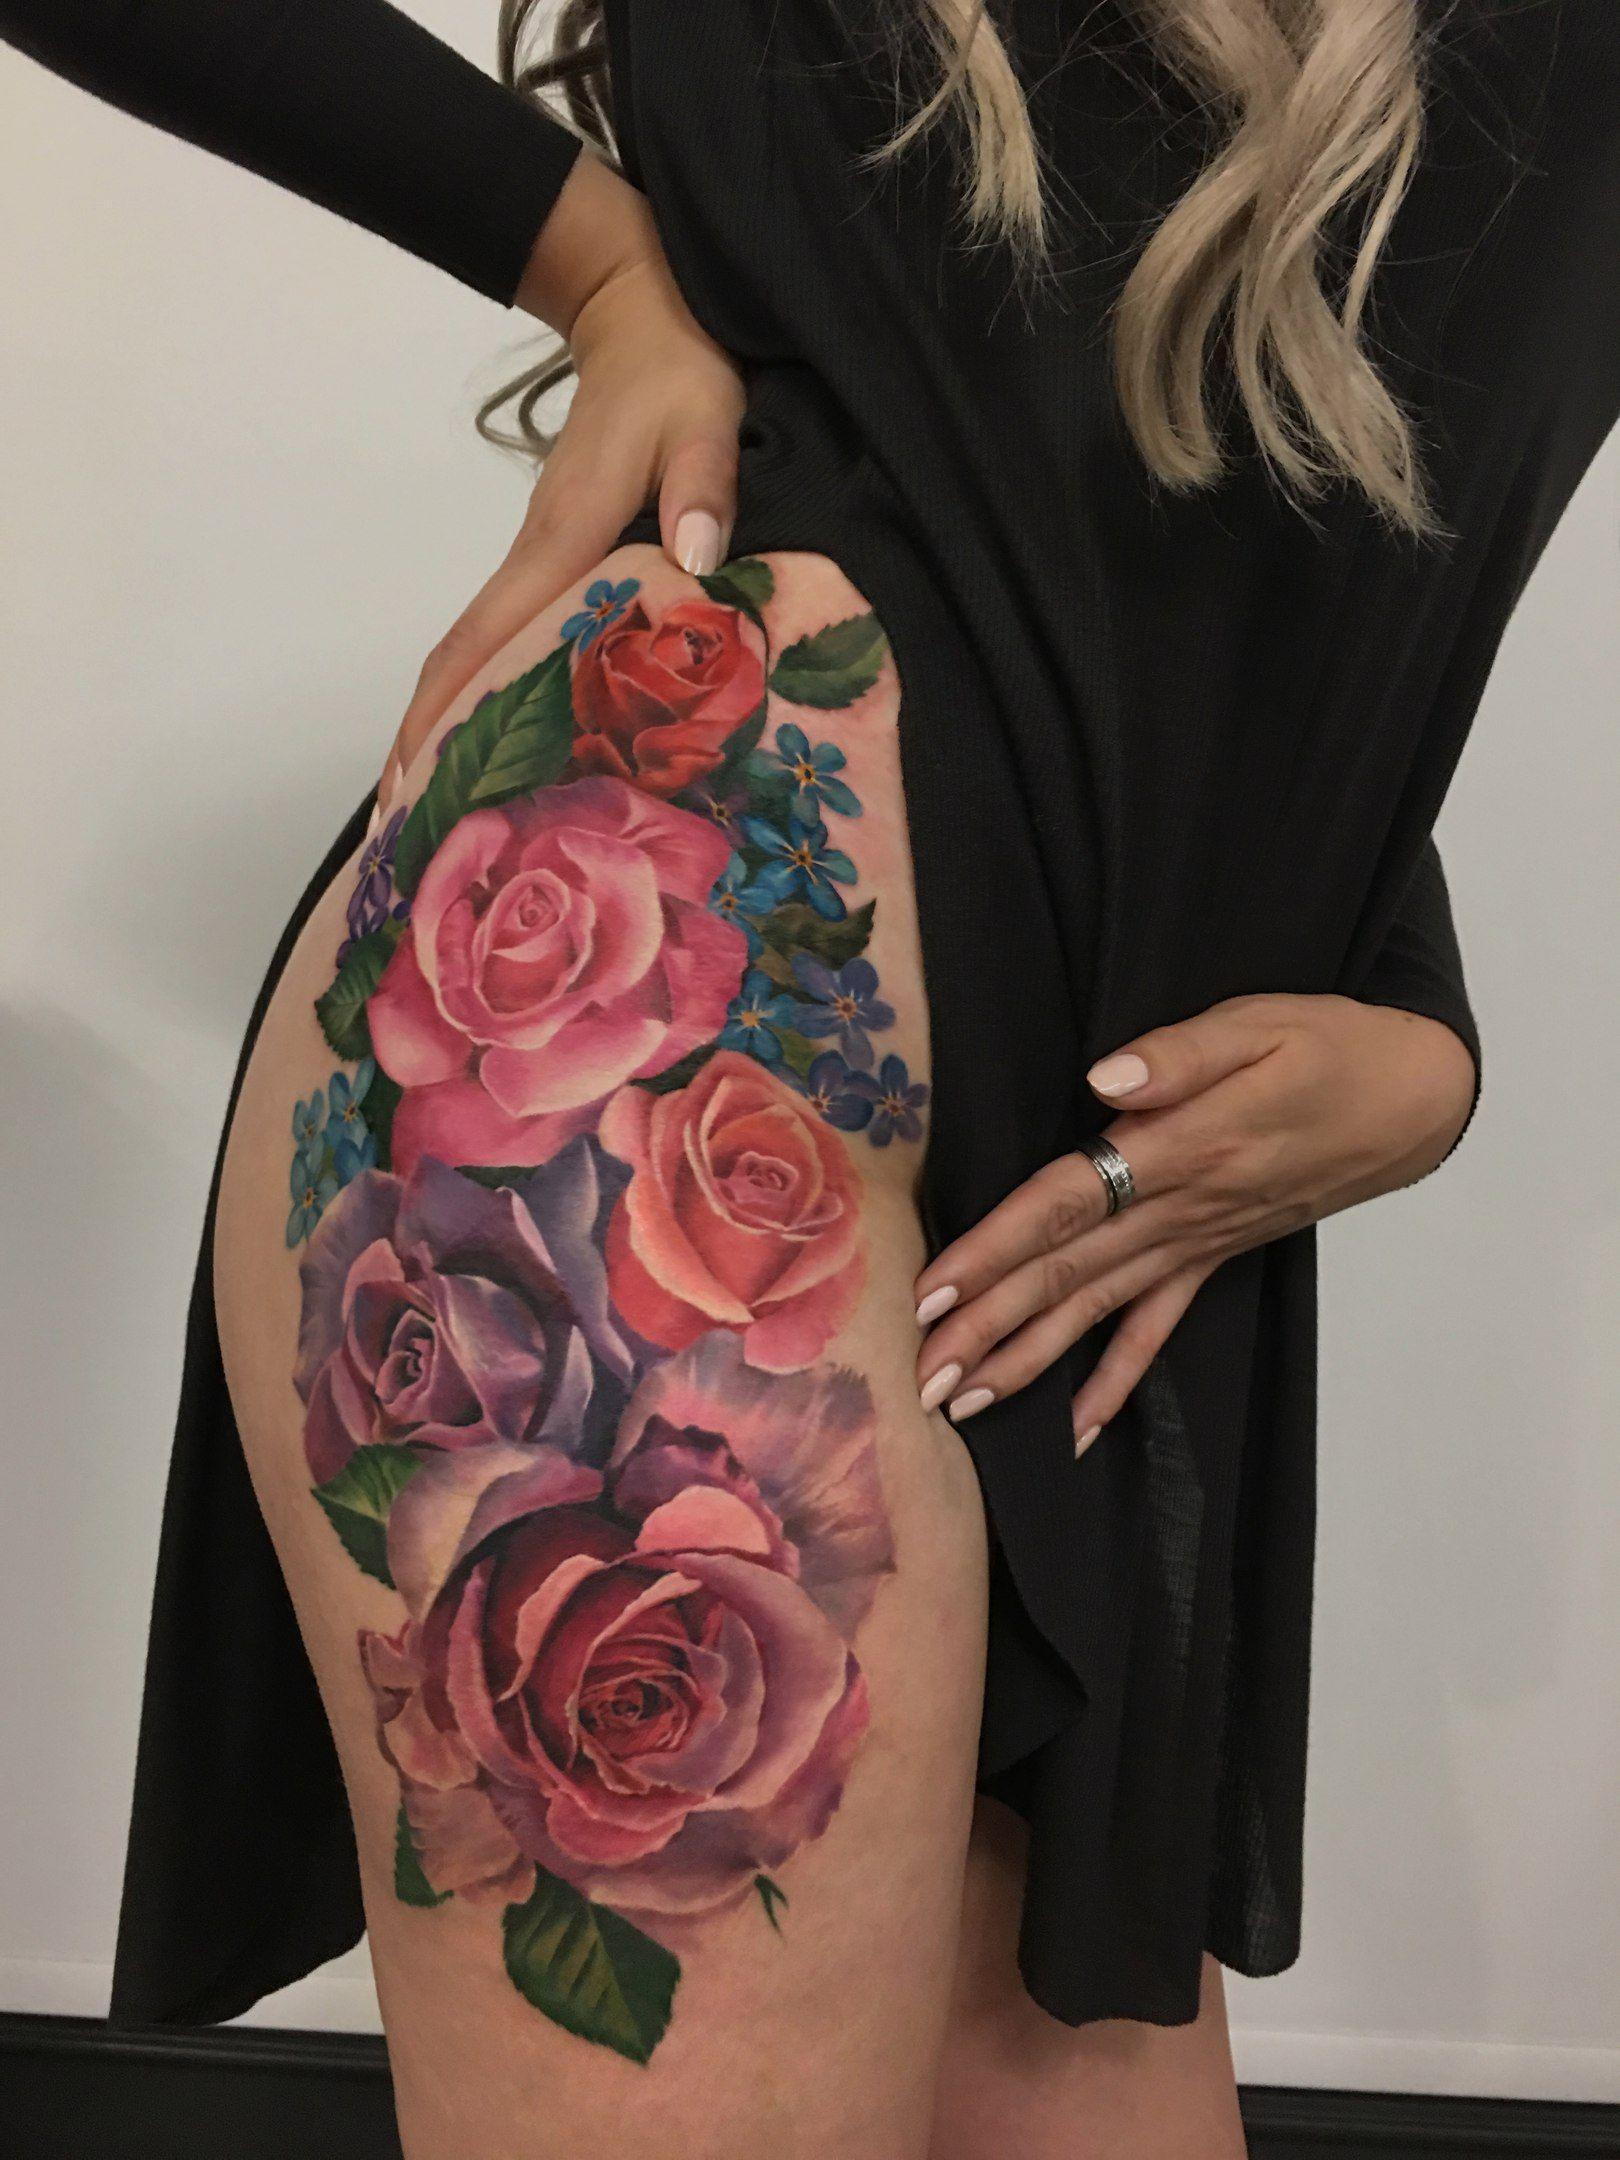 Flower Tattoo On Thigh New School By Antonina Troshina Flower Thigh Tattoos Thigh Tattoo Designs Thigh Tattoo